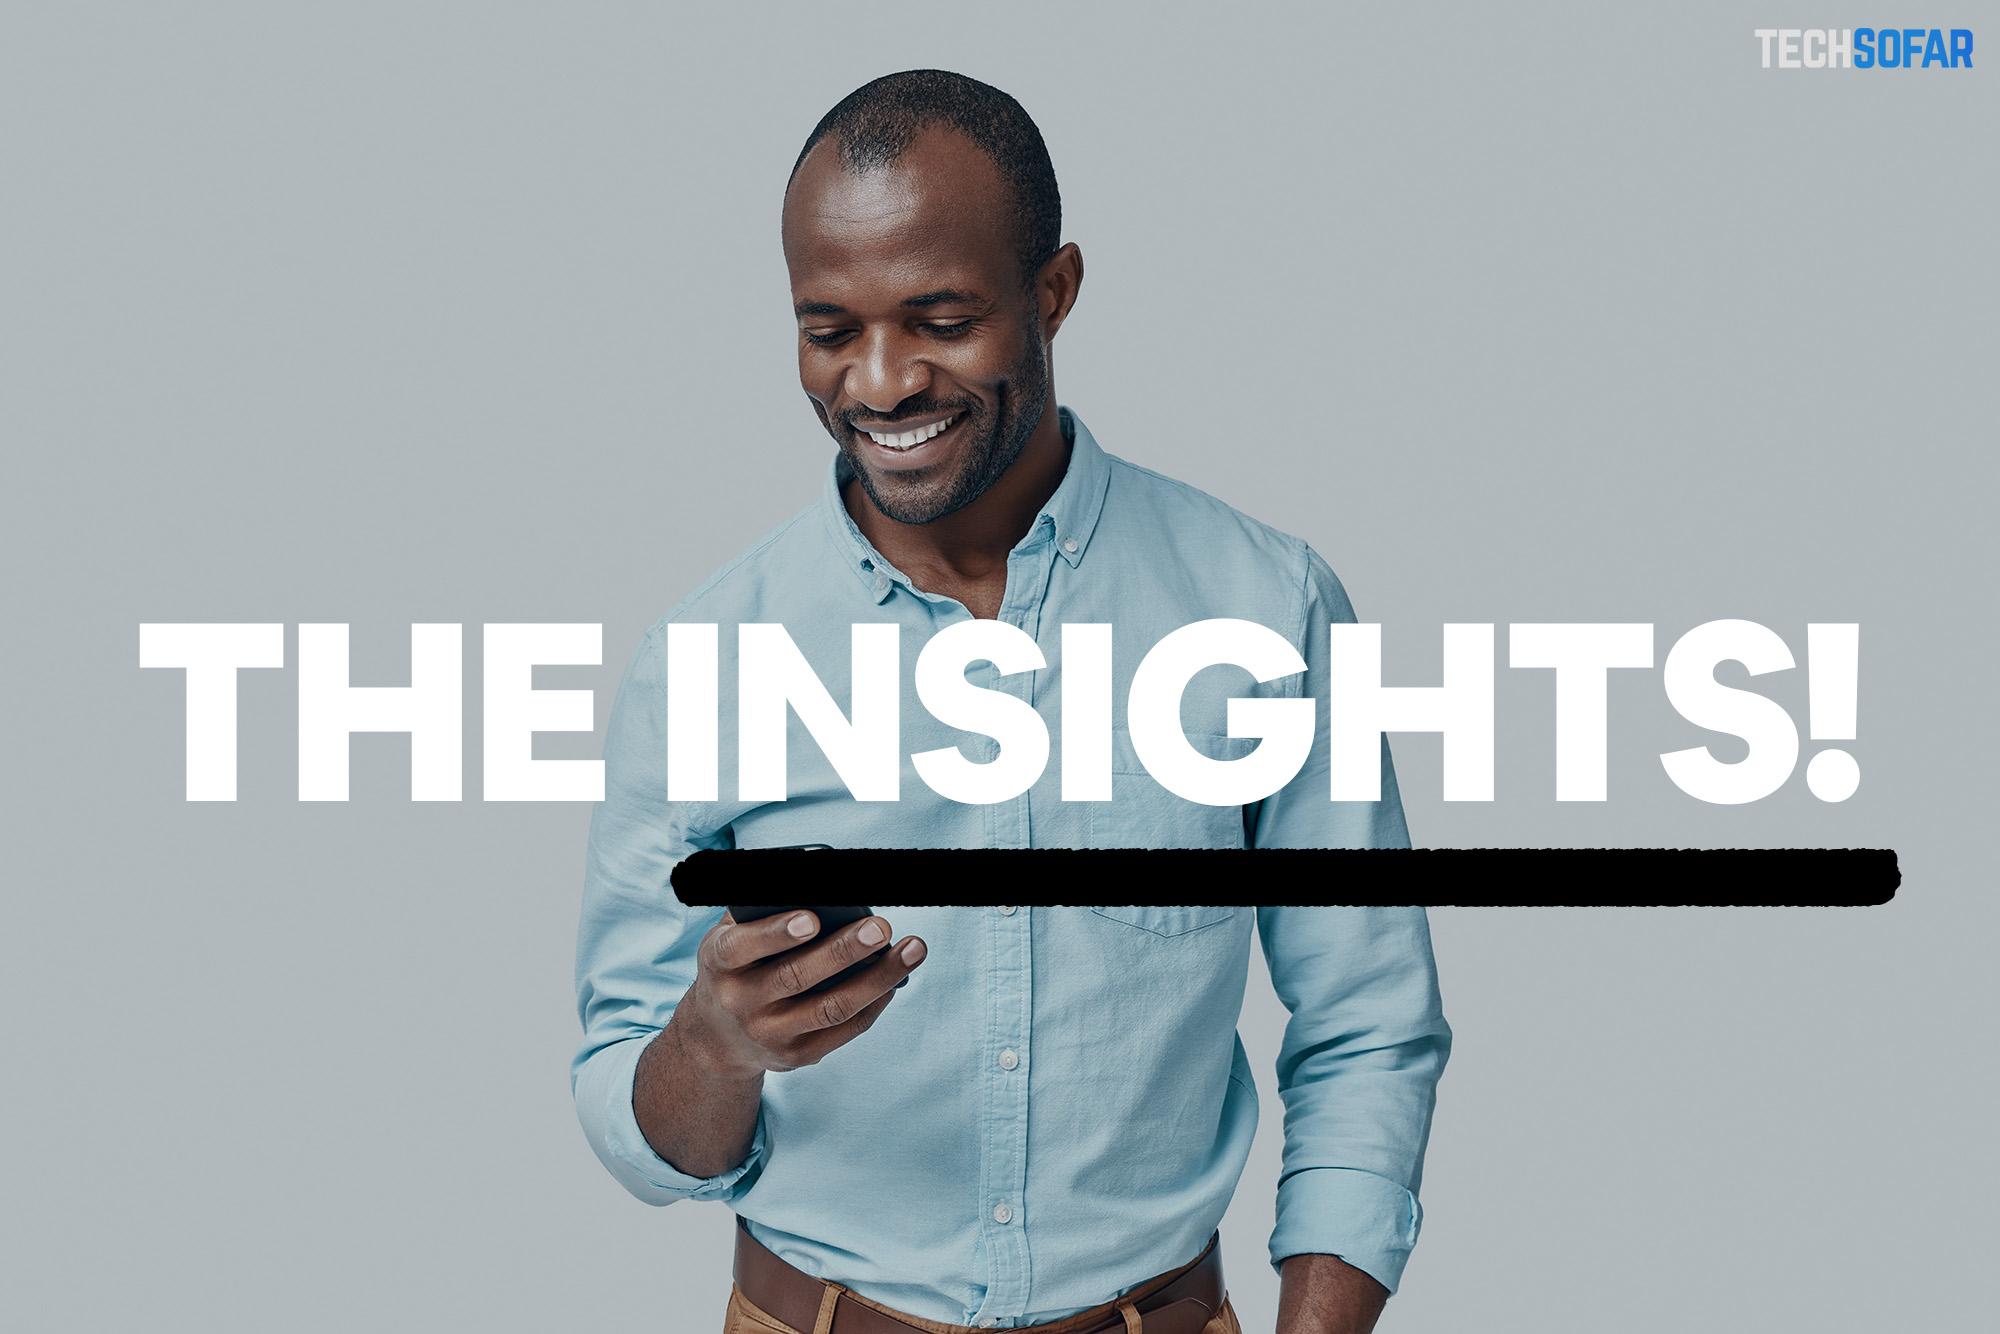 The Insights!   TechSoFar